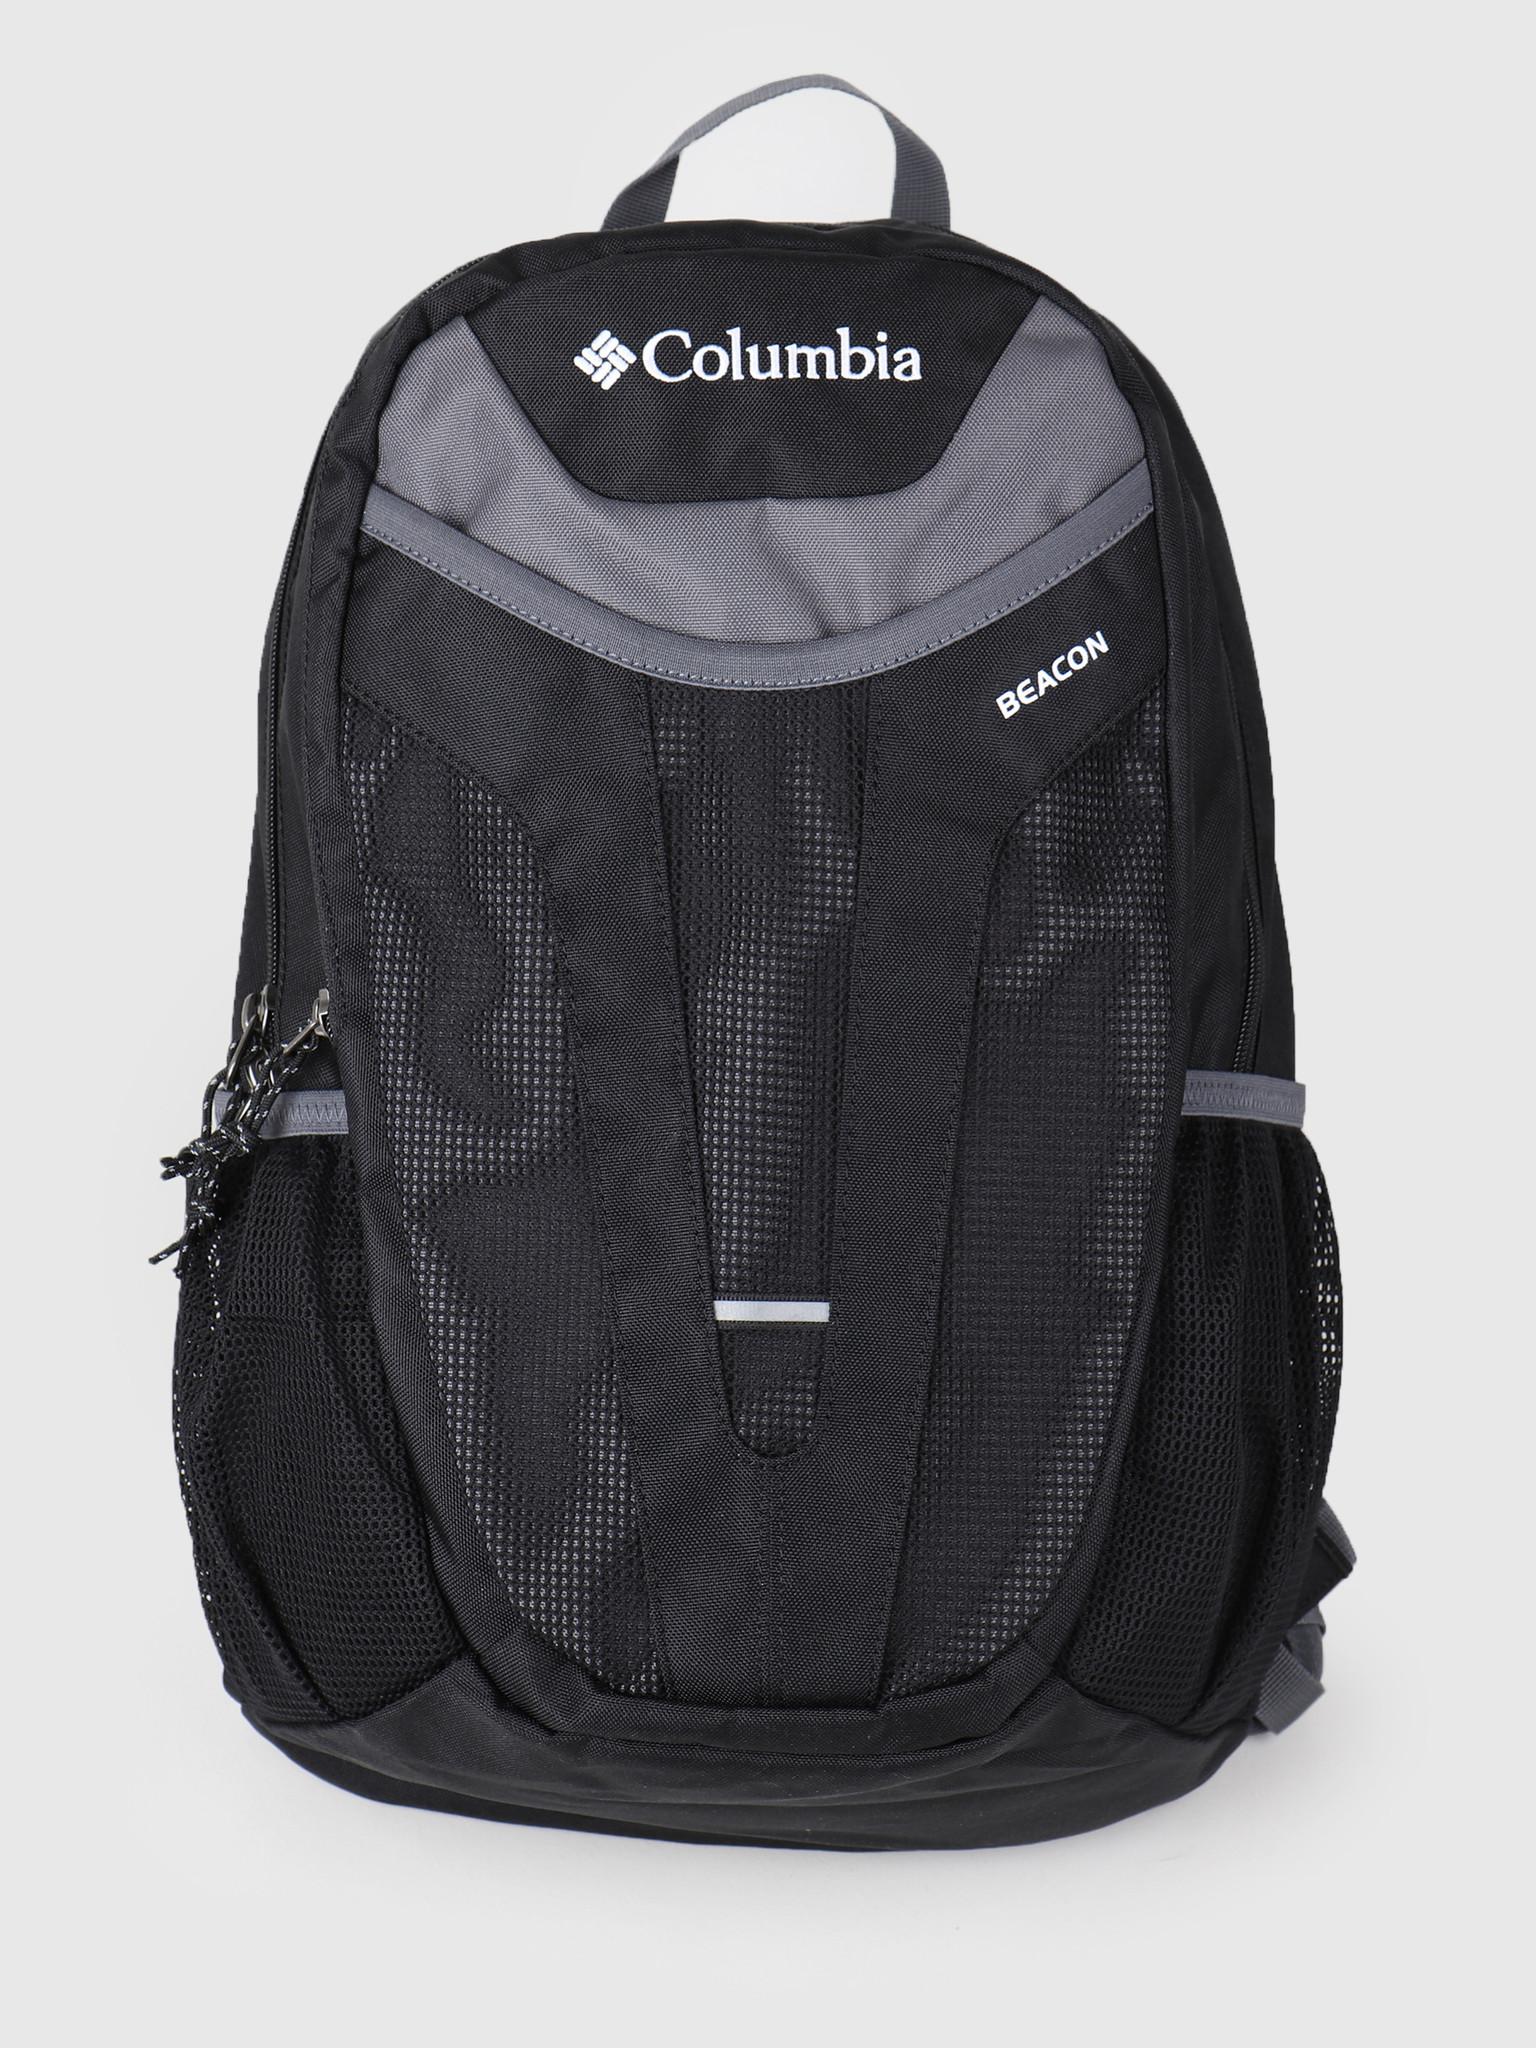 Columbia Columbia Beacon Daypack Black Graphite 1587561013